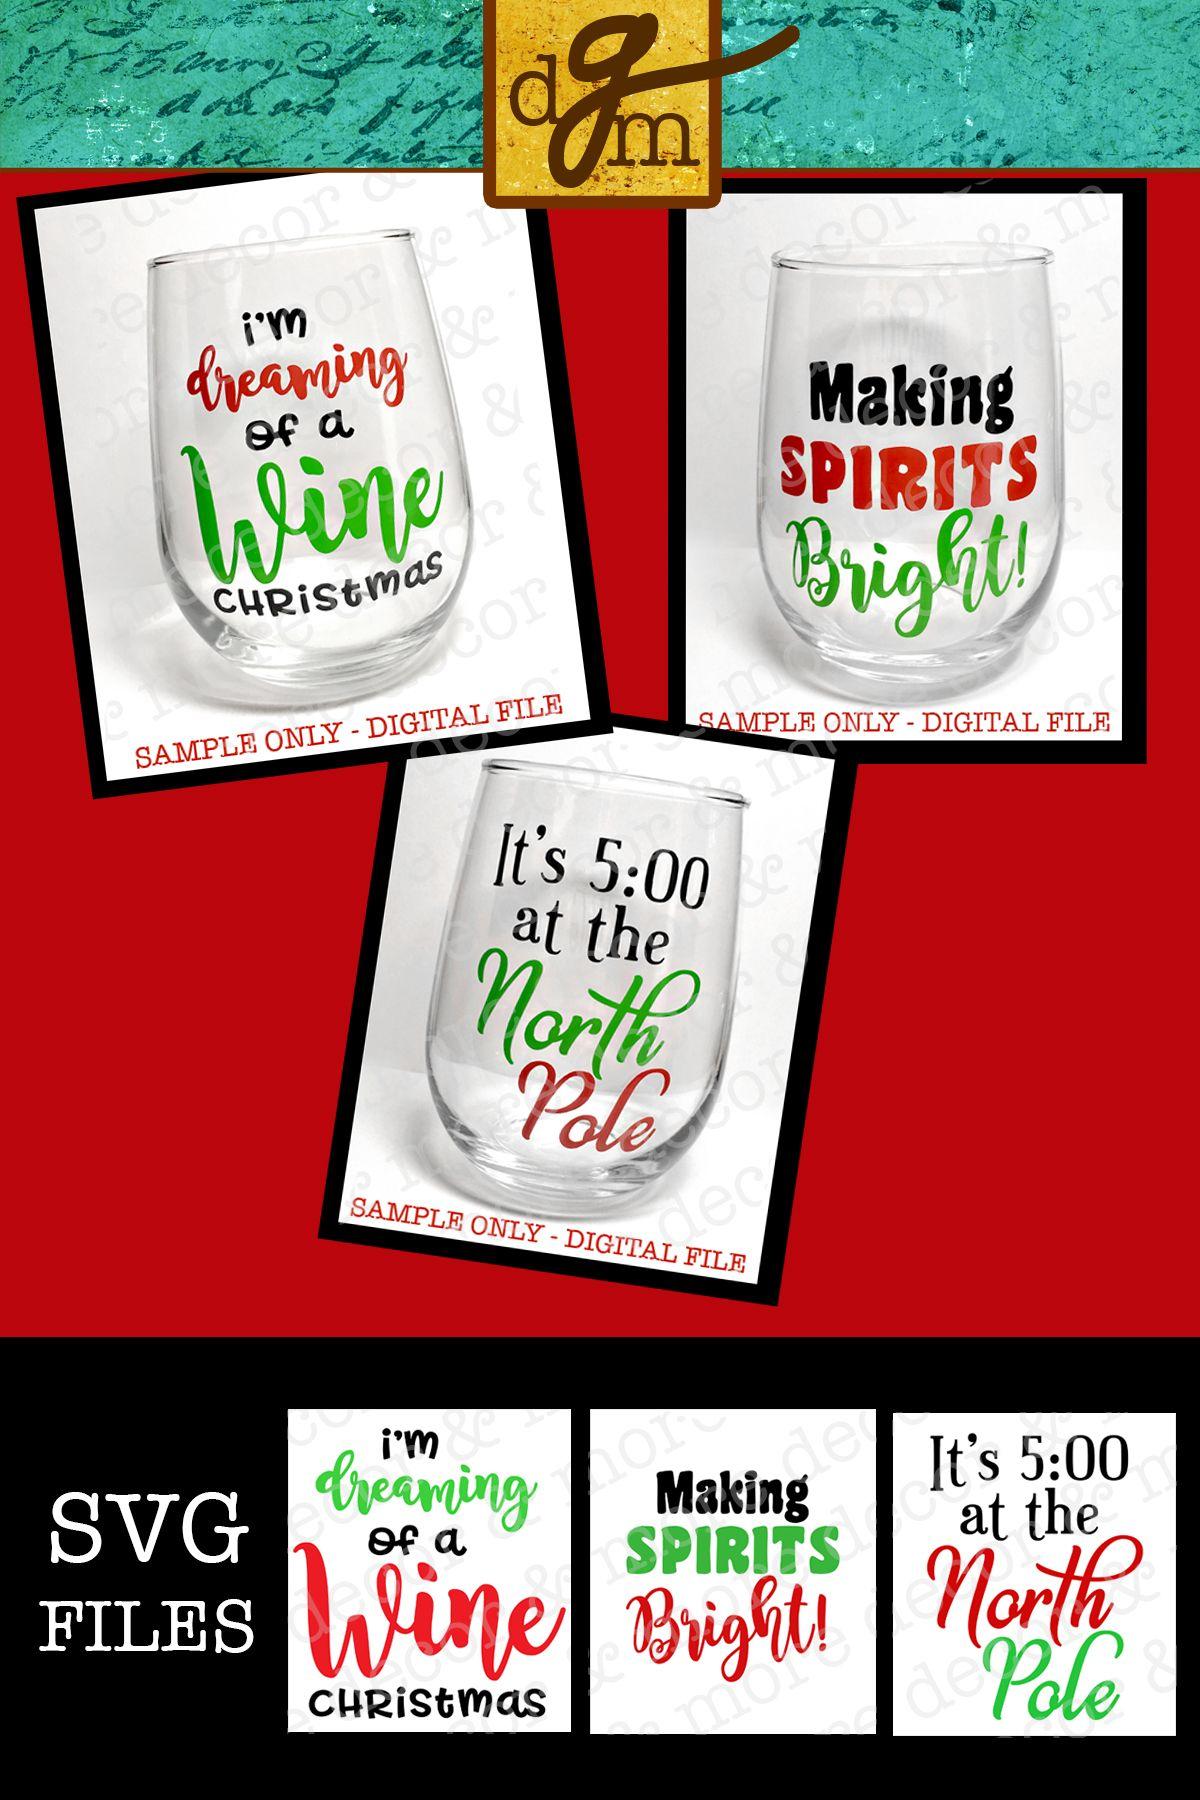 Christmas Wine Glass Svg Bundle Svg Files For Cricut Christmas Wine Glass Decal Wine Svg Bundle Christmas Svg File Gifts For Her Svg Christmas Wine Glasses Christmas Wine Diy Christmas Mug